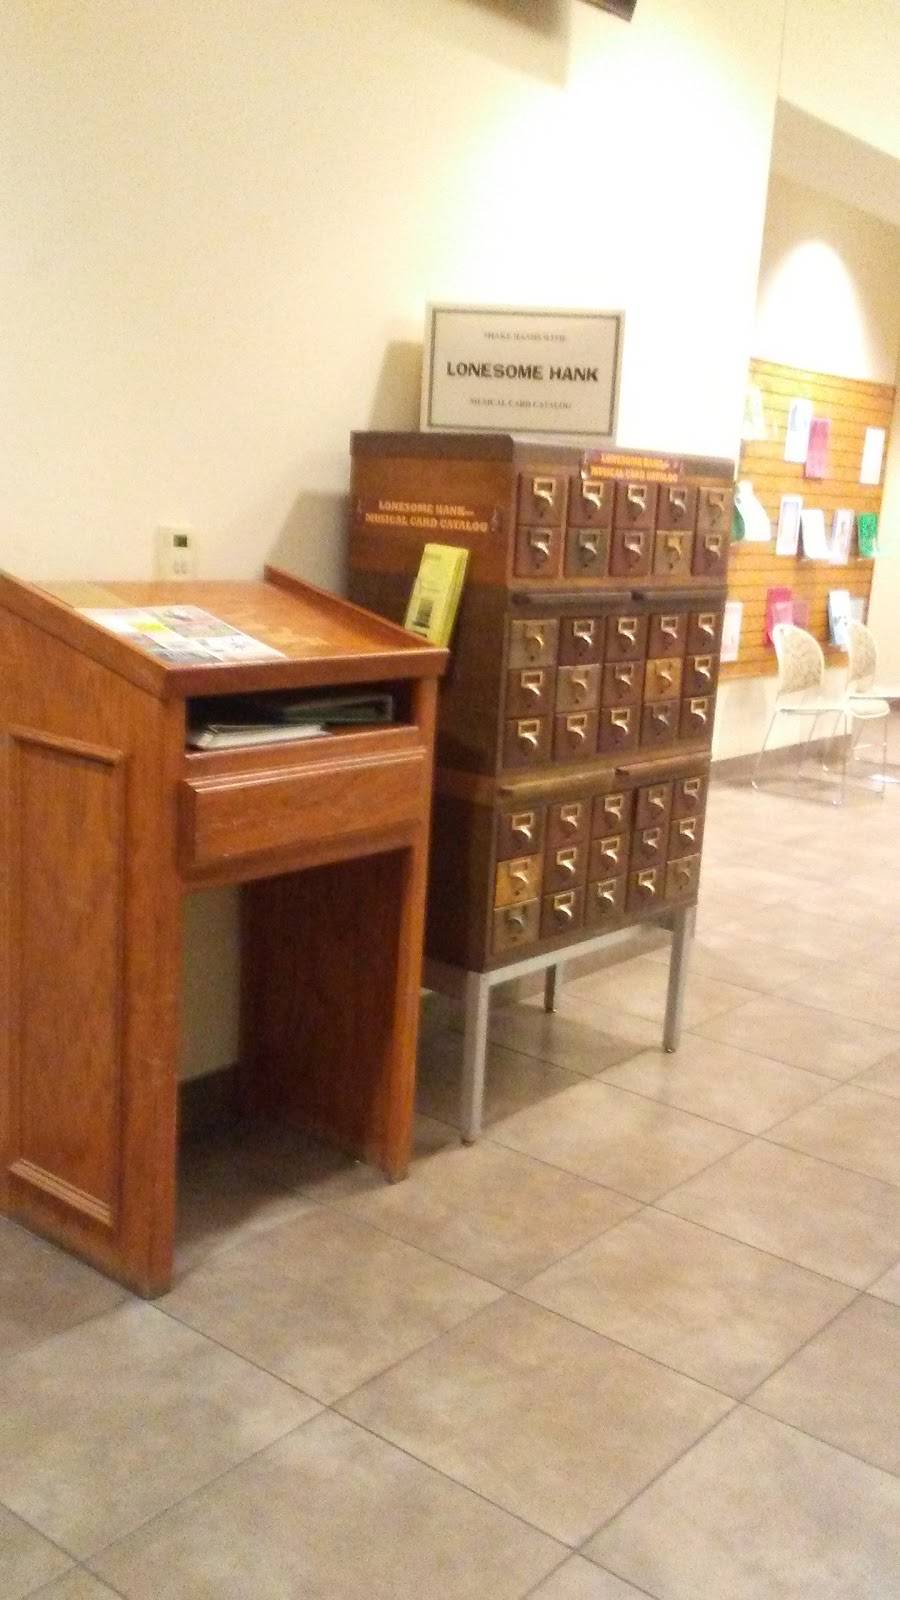 Haltom City Public Library - library  | Photo 8 of 9 | Address: 4809 Haltom Rd, Haltom City, TX 76117, USA | Phone: (817) 222-7786